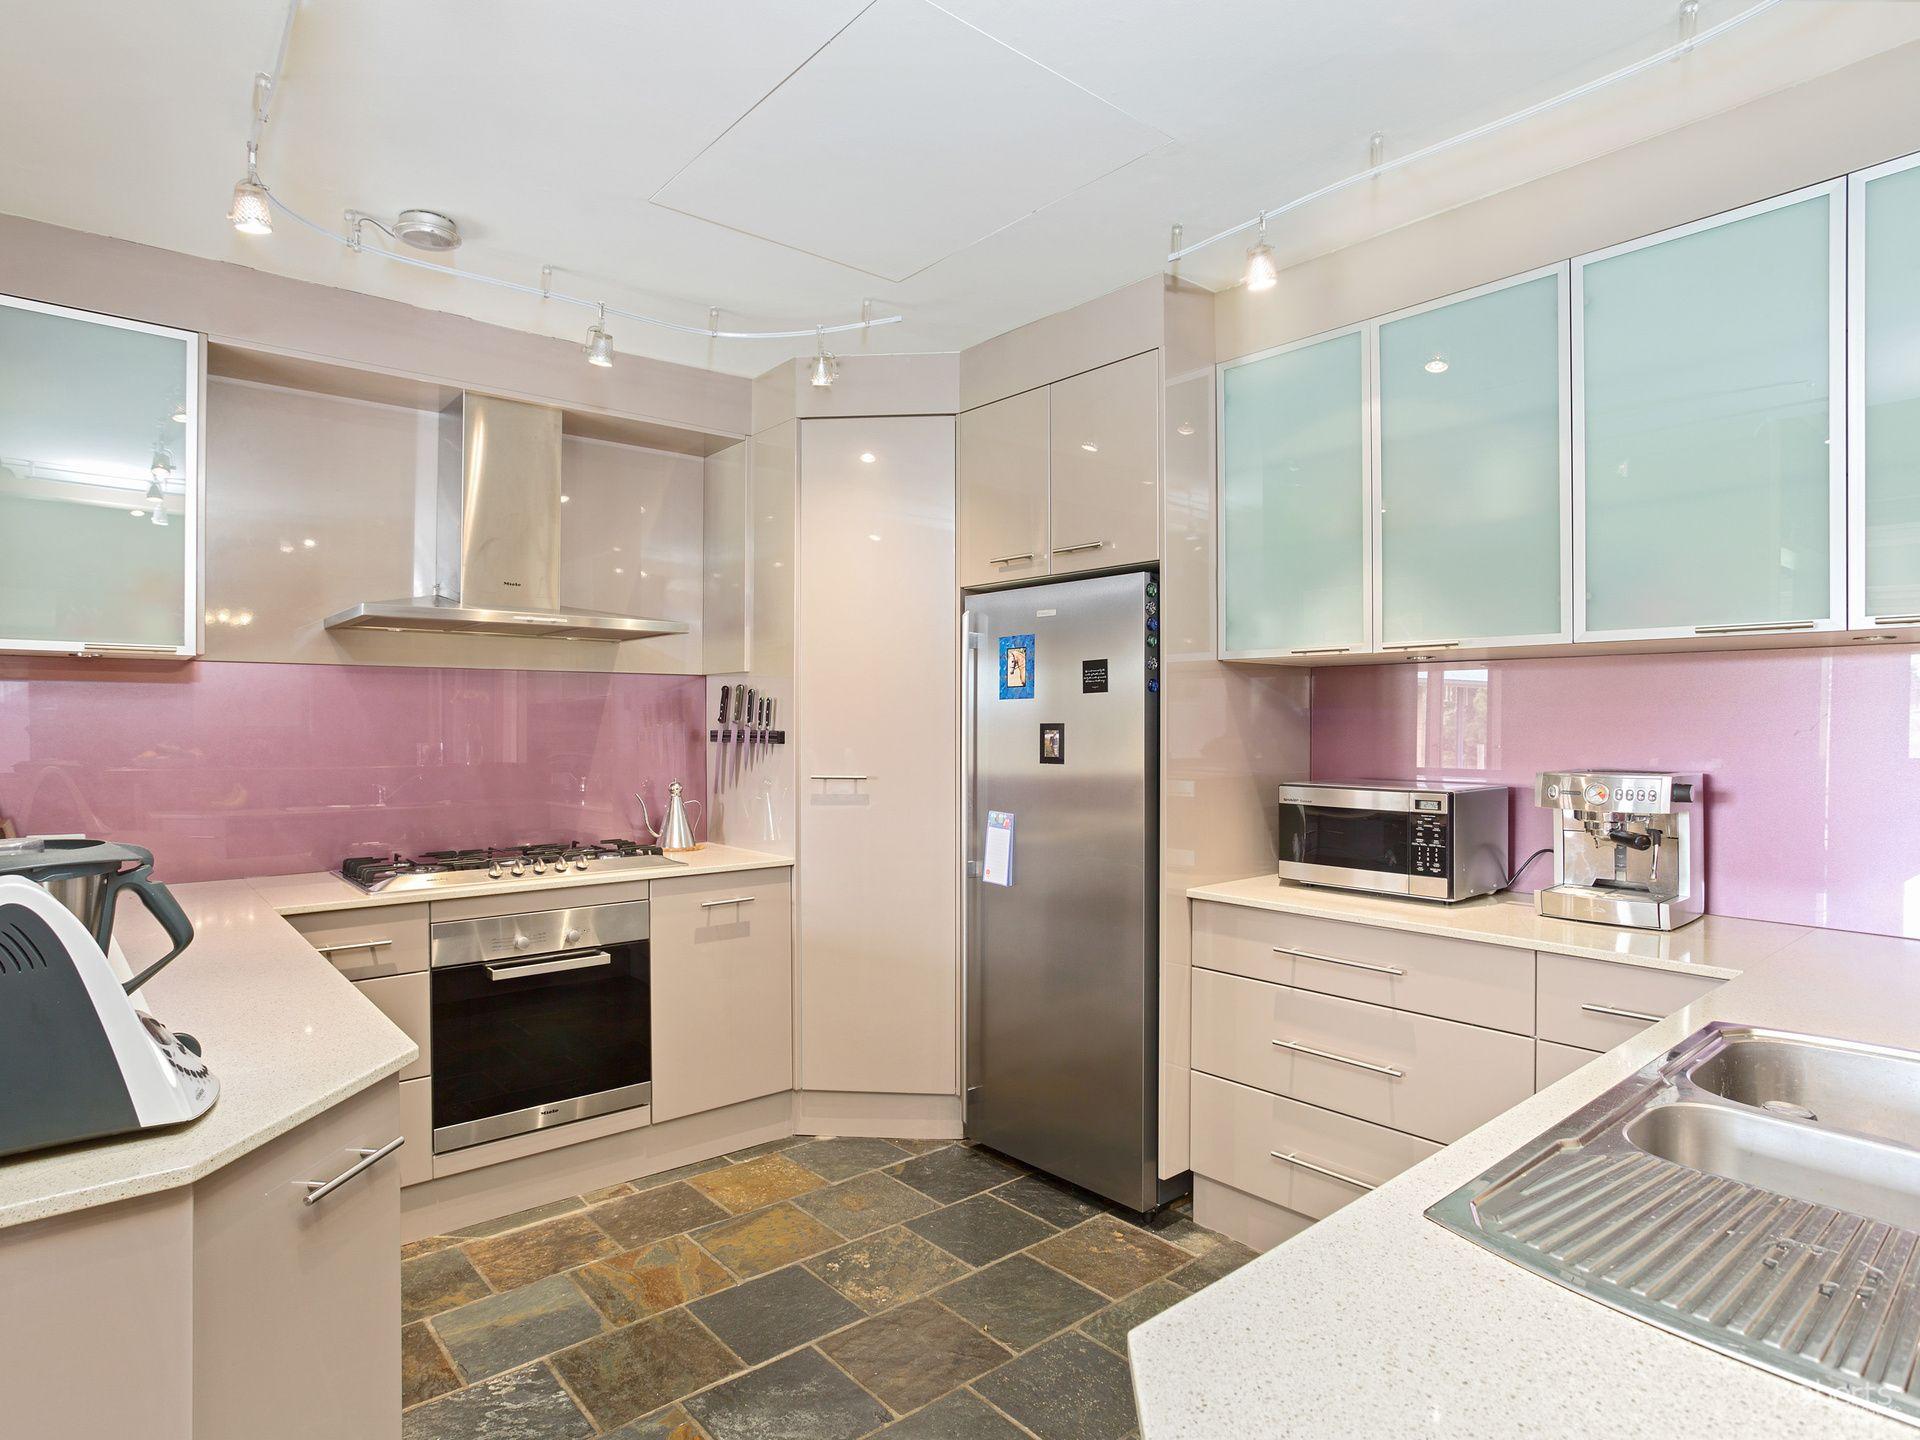 14be90dda36 496 South Bridgenorth Road - Bridgenorth , TAS 7277 House For Sale ...